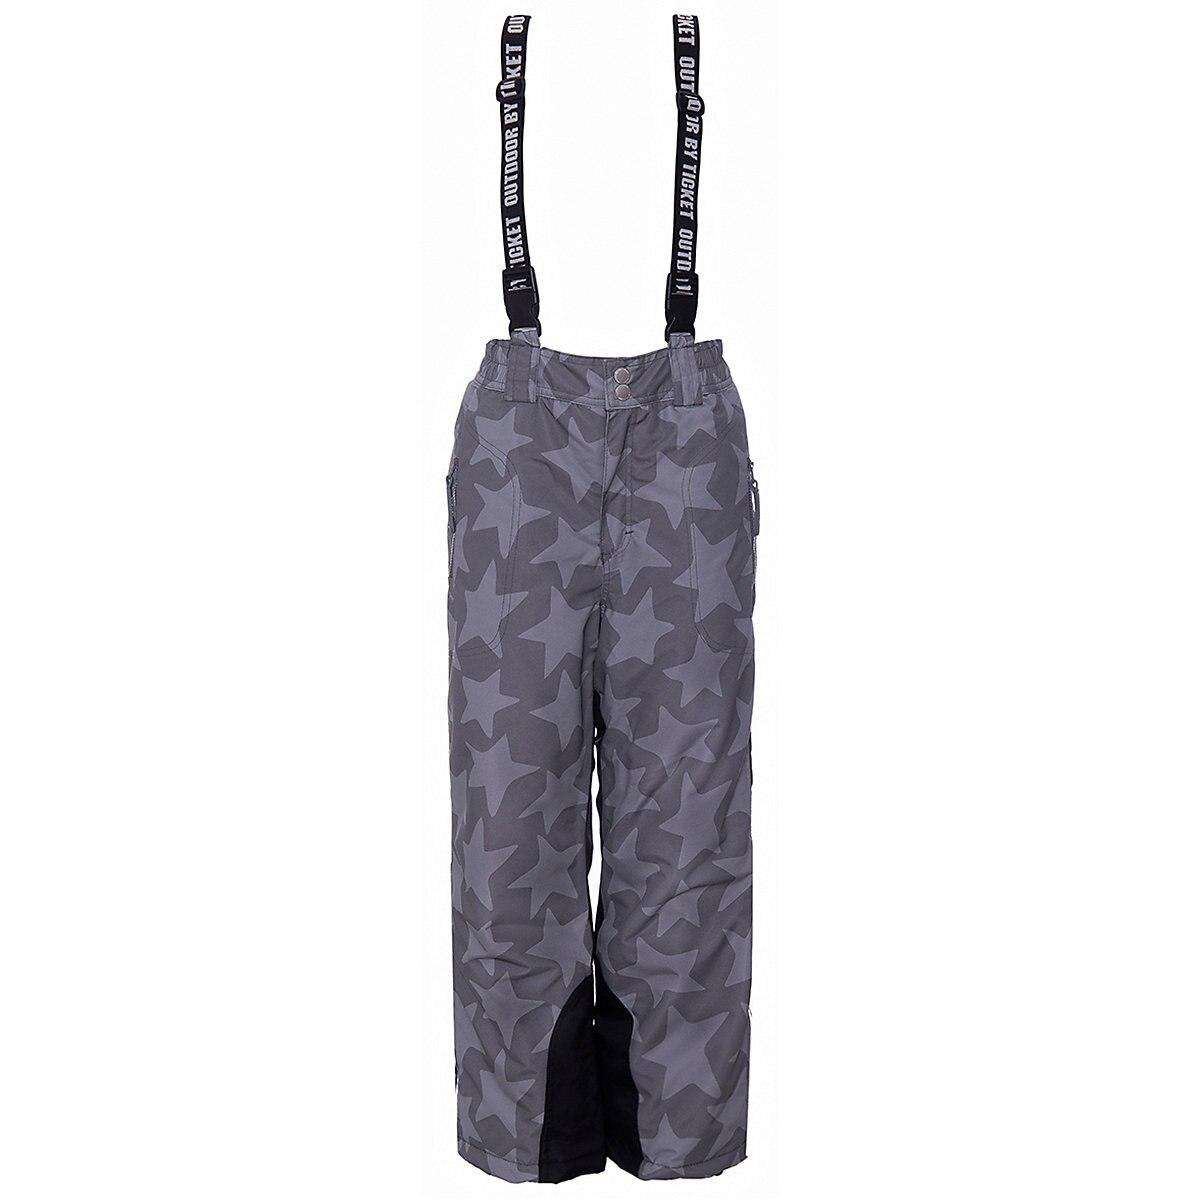 Pants & Capris TICKET TO HEAVEN for girls 8953513 Leggings Hot Warm Children clothes Kids